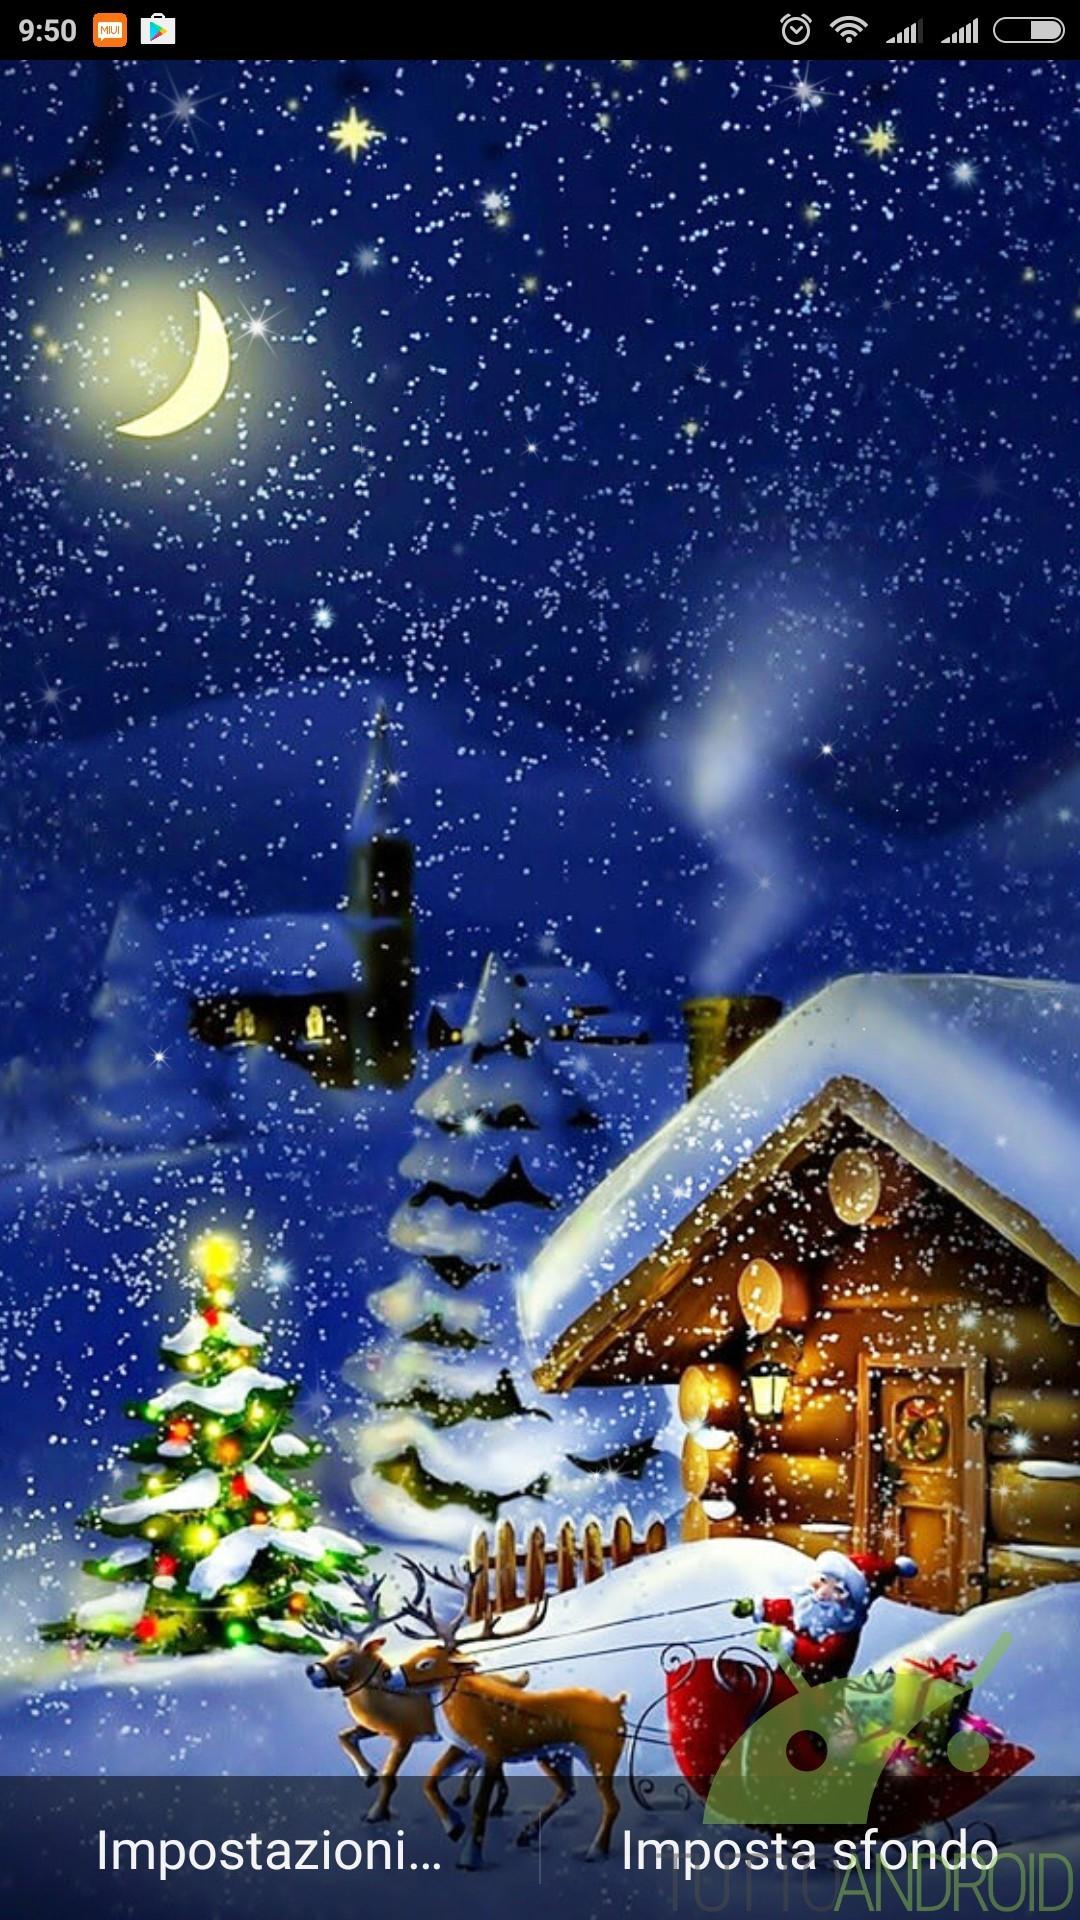 Sfondi notte 54 immagini for Sfondi natalizi 1920x1080